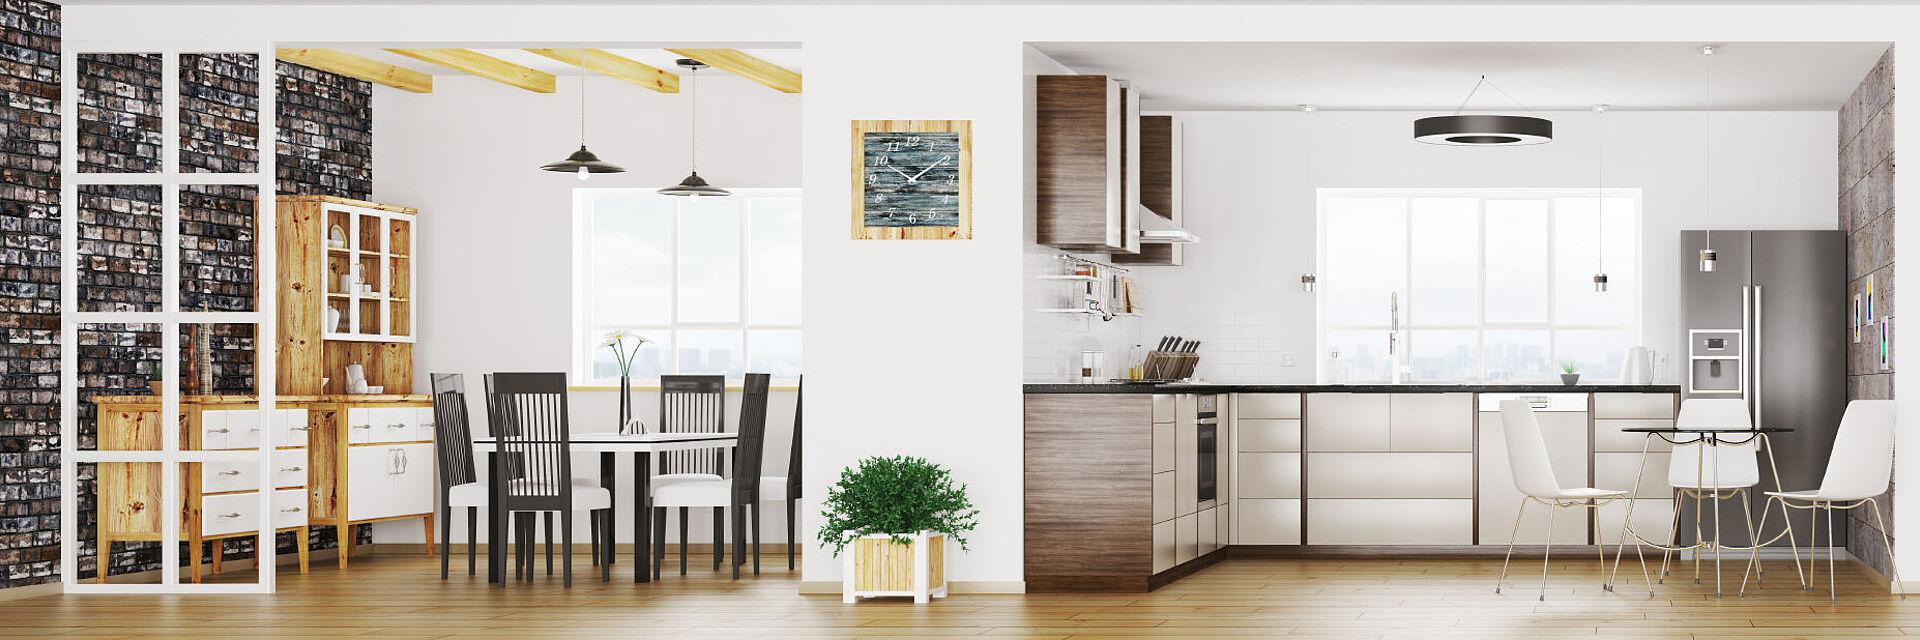 Furniture & kitchen production - Leitz